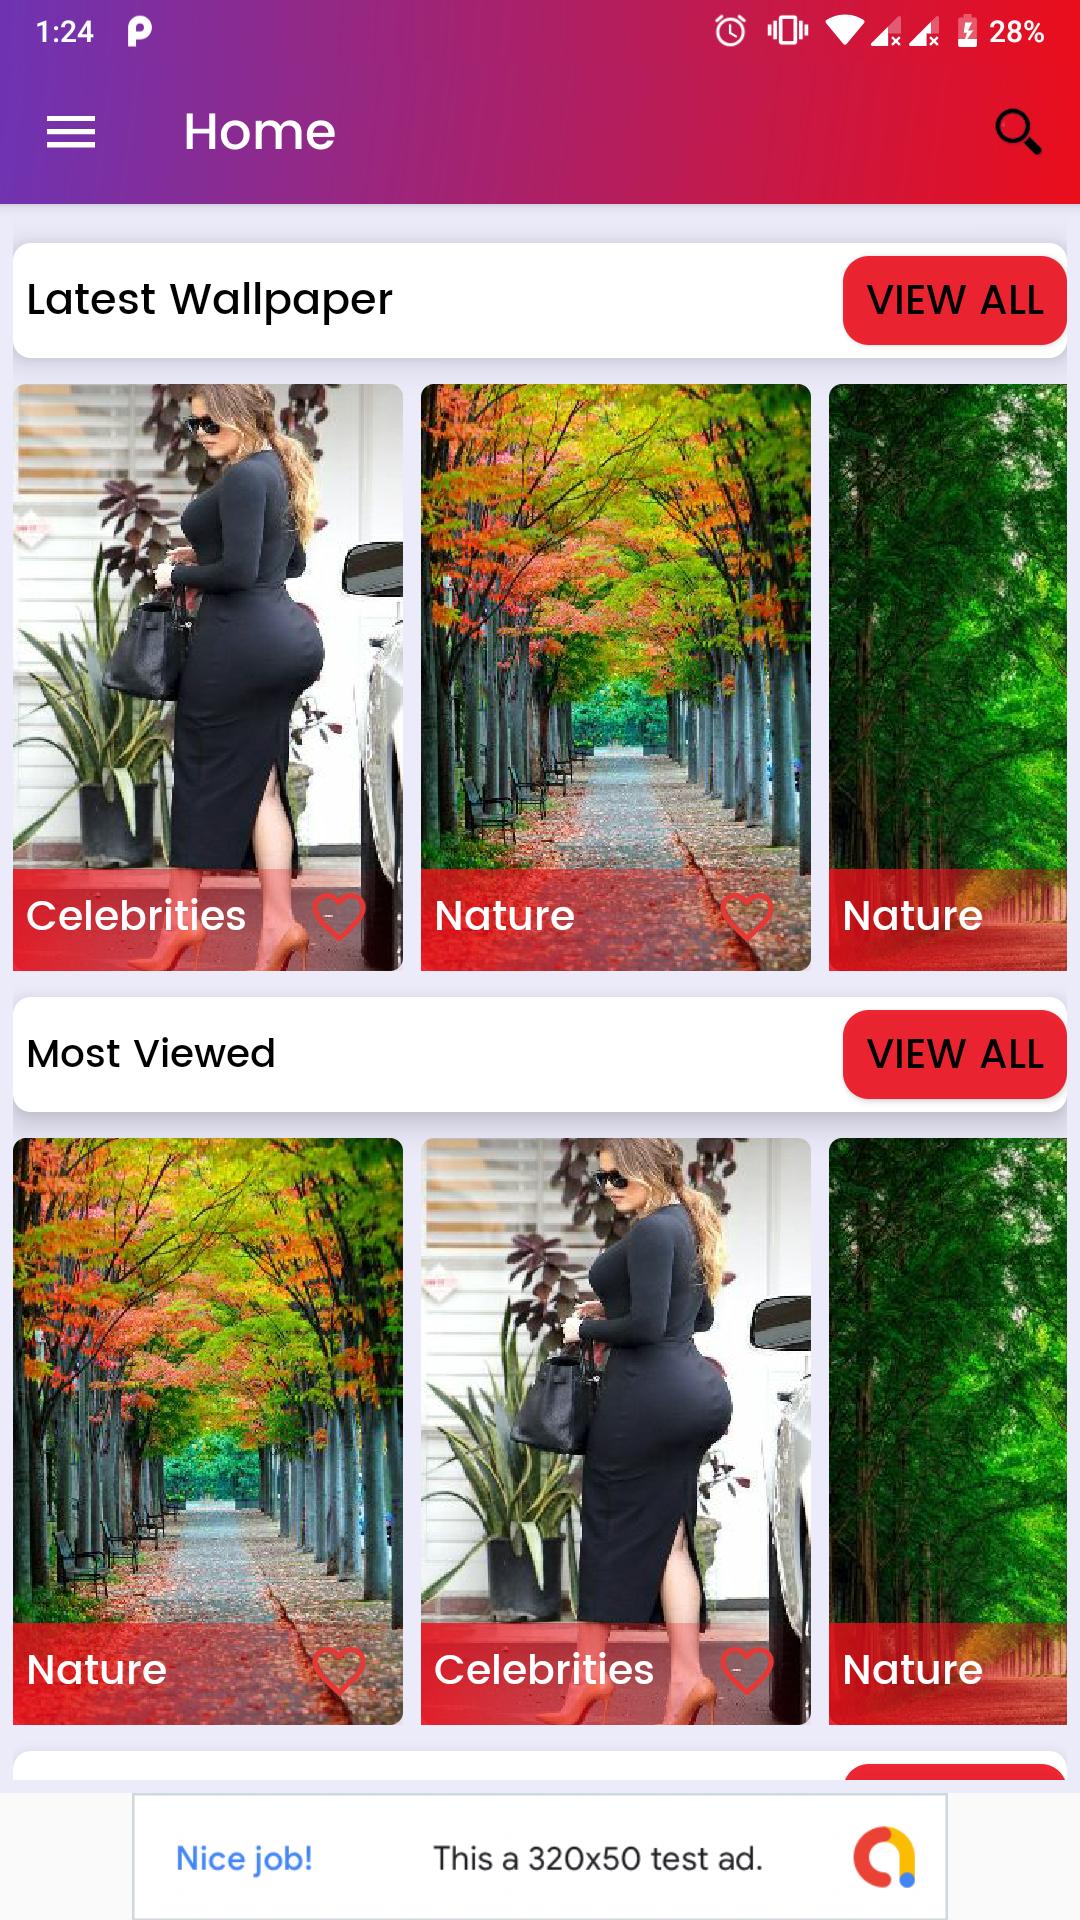 Universal Wallpaper Android app (HD, Full HD, 4K, Ultra